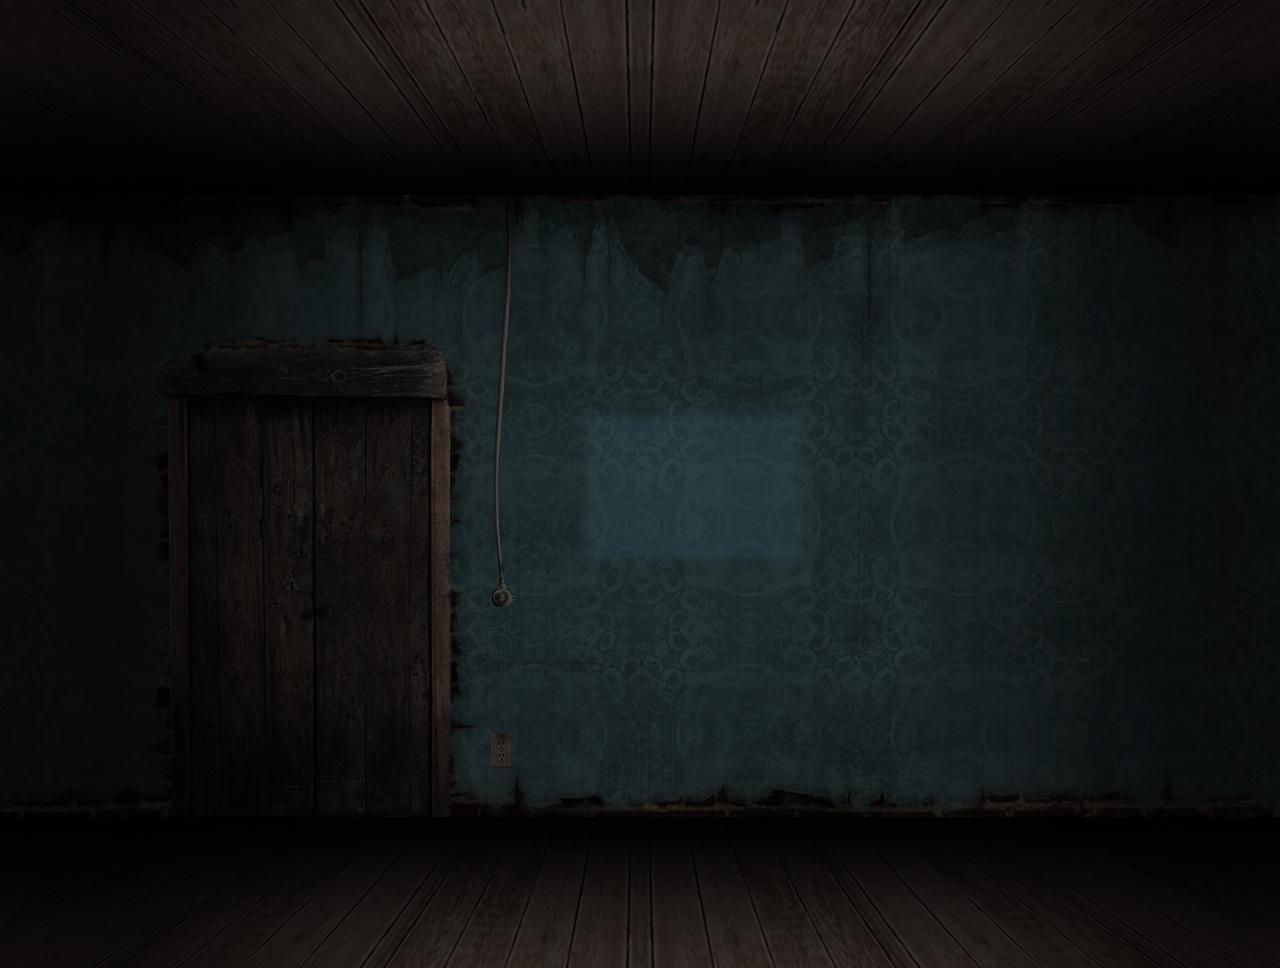 Dark Room 2 By Bavometh